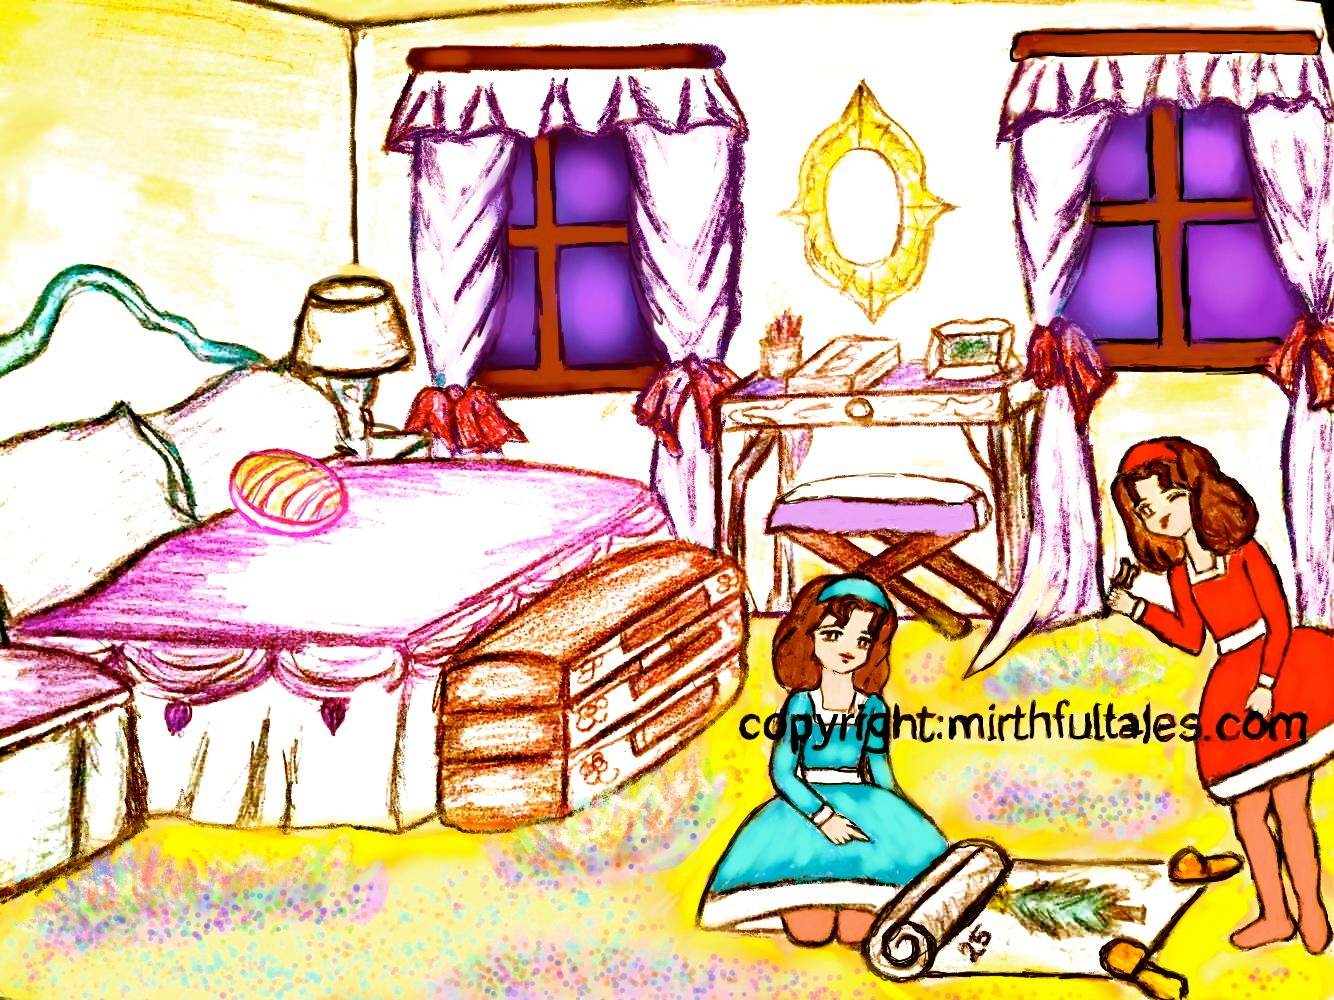 new_fairy_tales.mirthfultales.com_Tina_and_Ella_Room